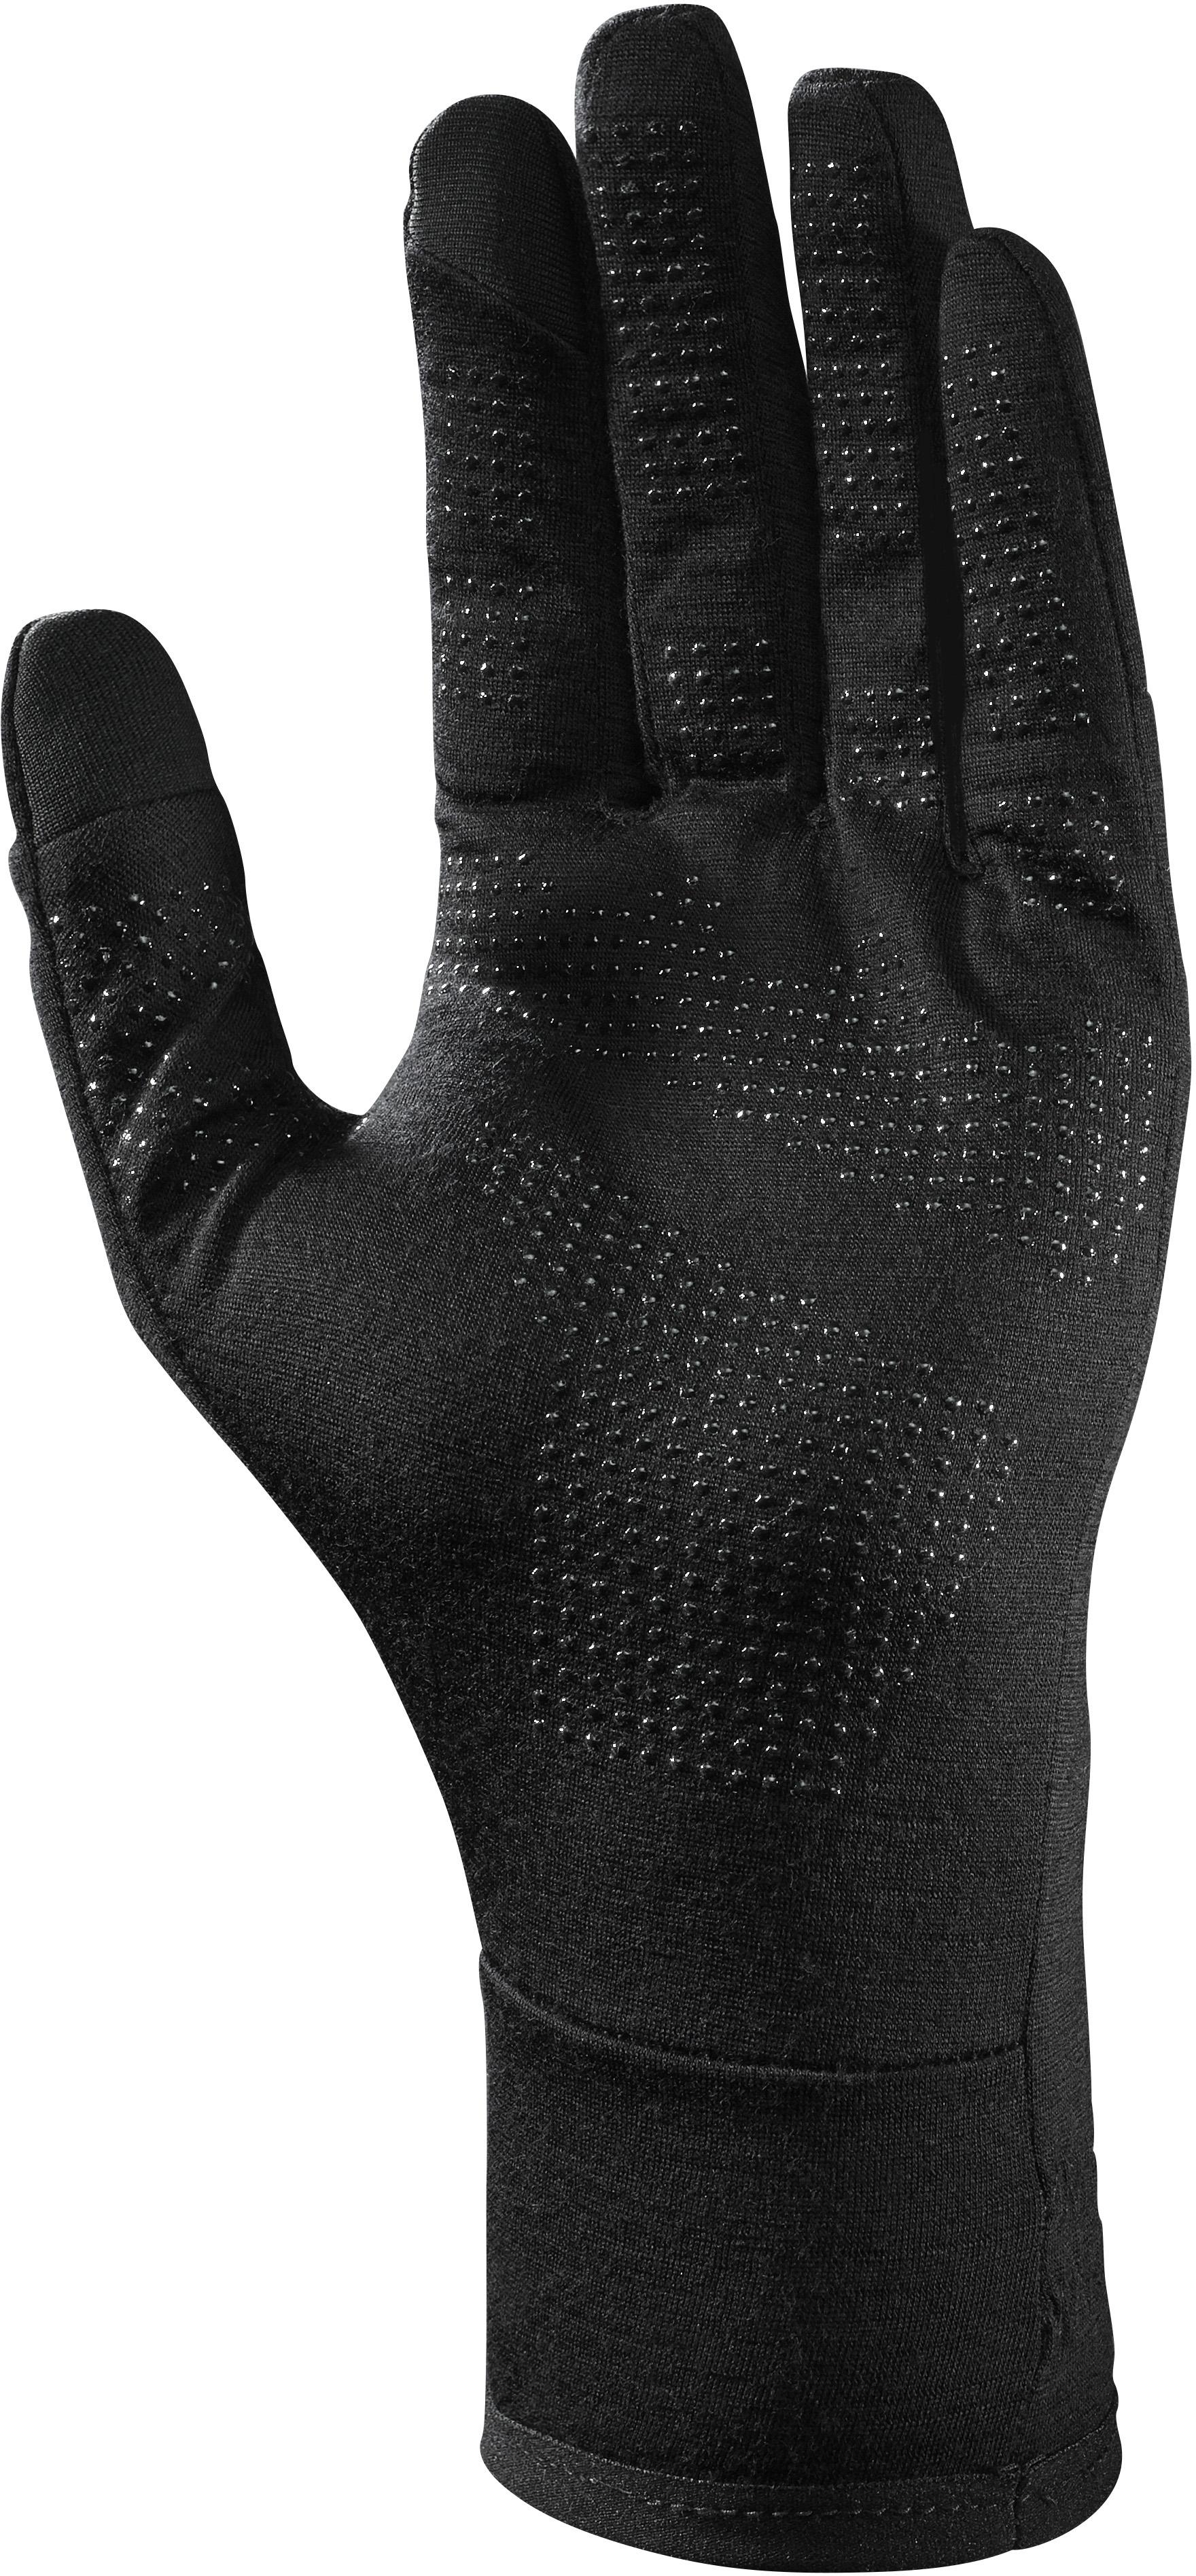 mavic ksyrium merino winter fahrrad handschuhe schwarz. Black Bedroom Furniture Sets. Home Design Ideas